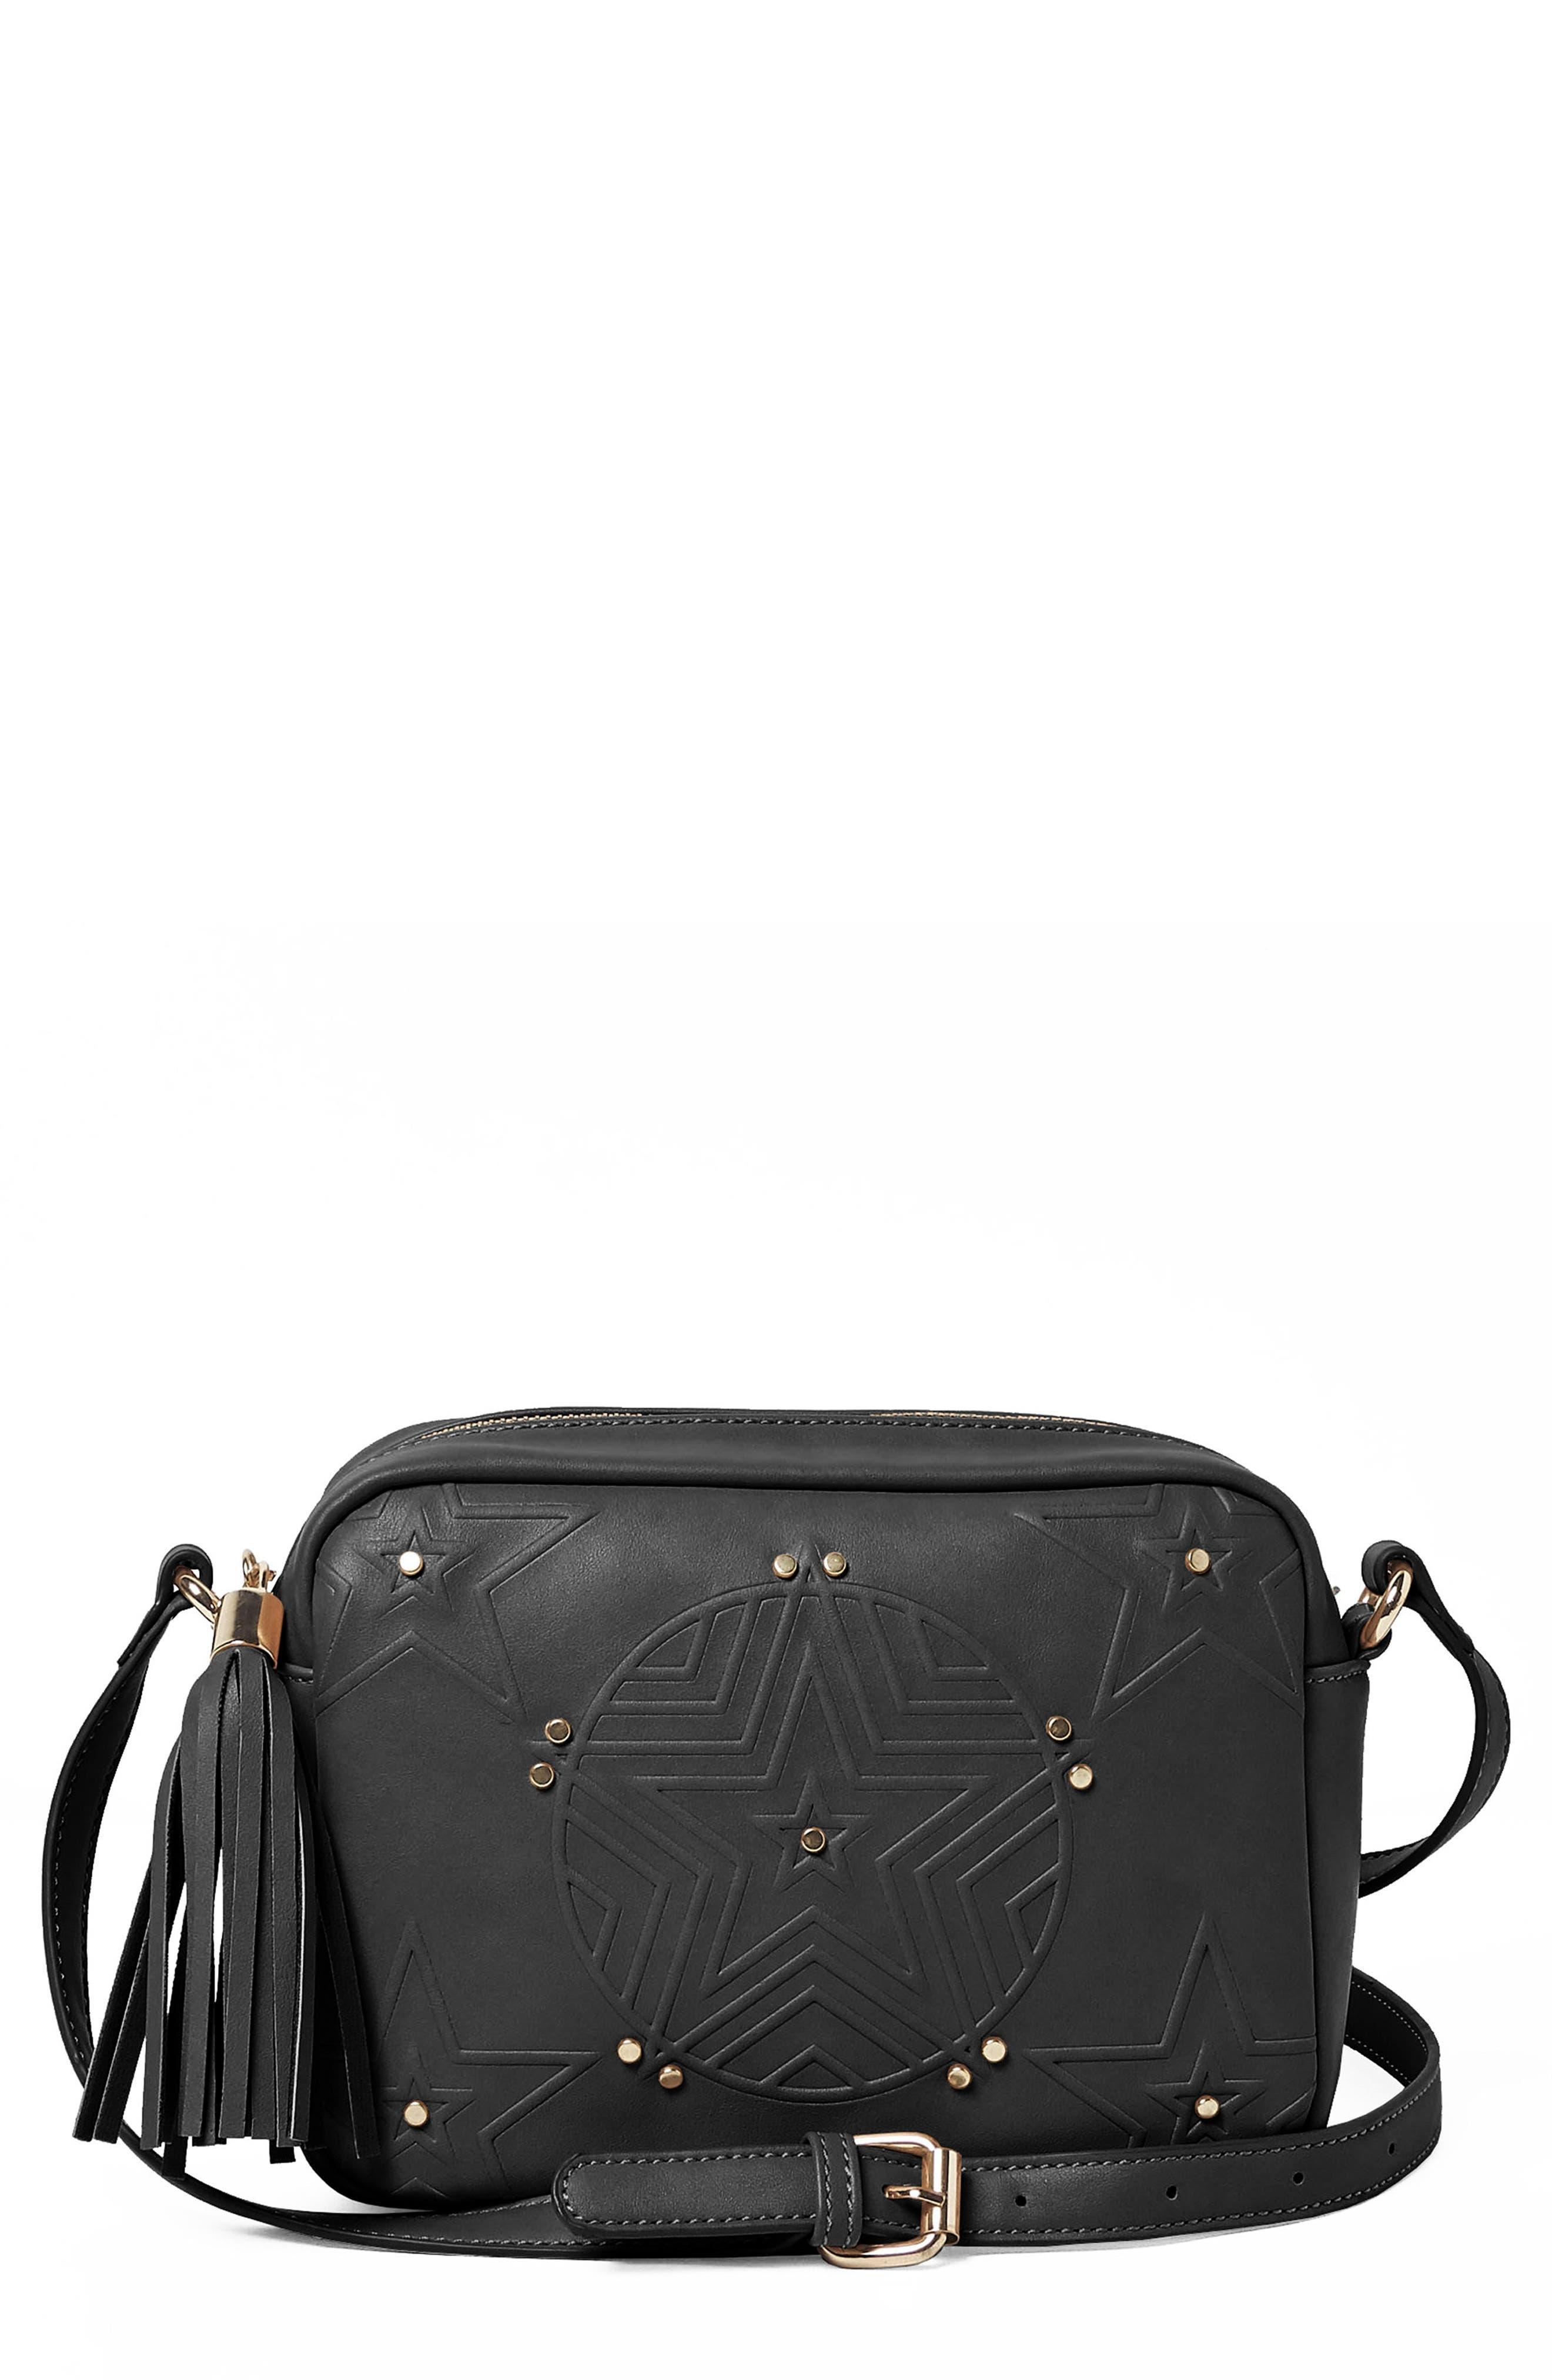 Stargazer Vegan Leather Crossbody Bag,                         Main,                         color, 001